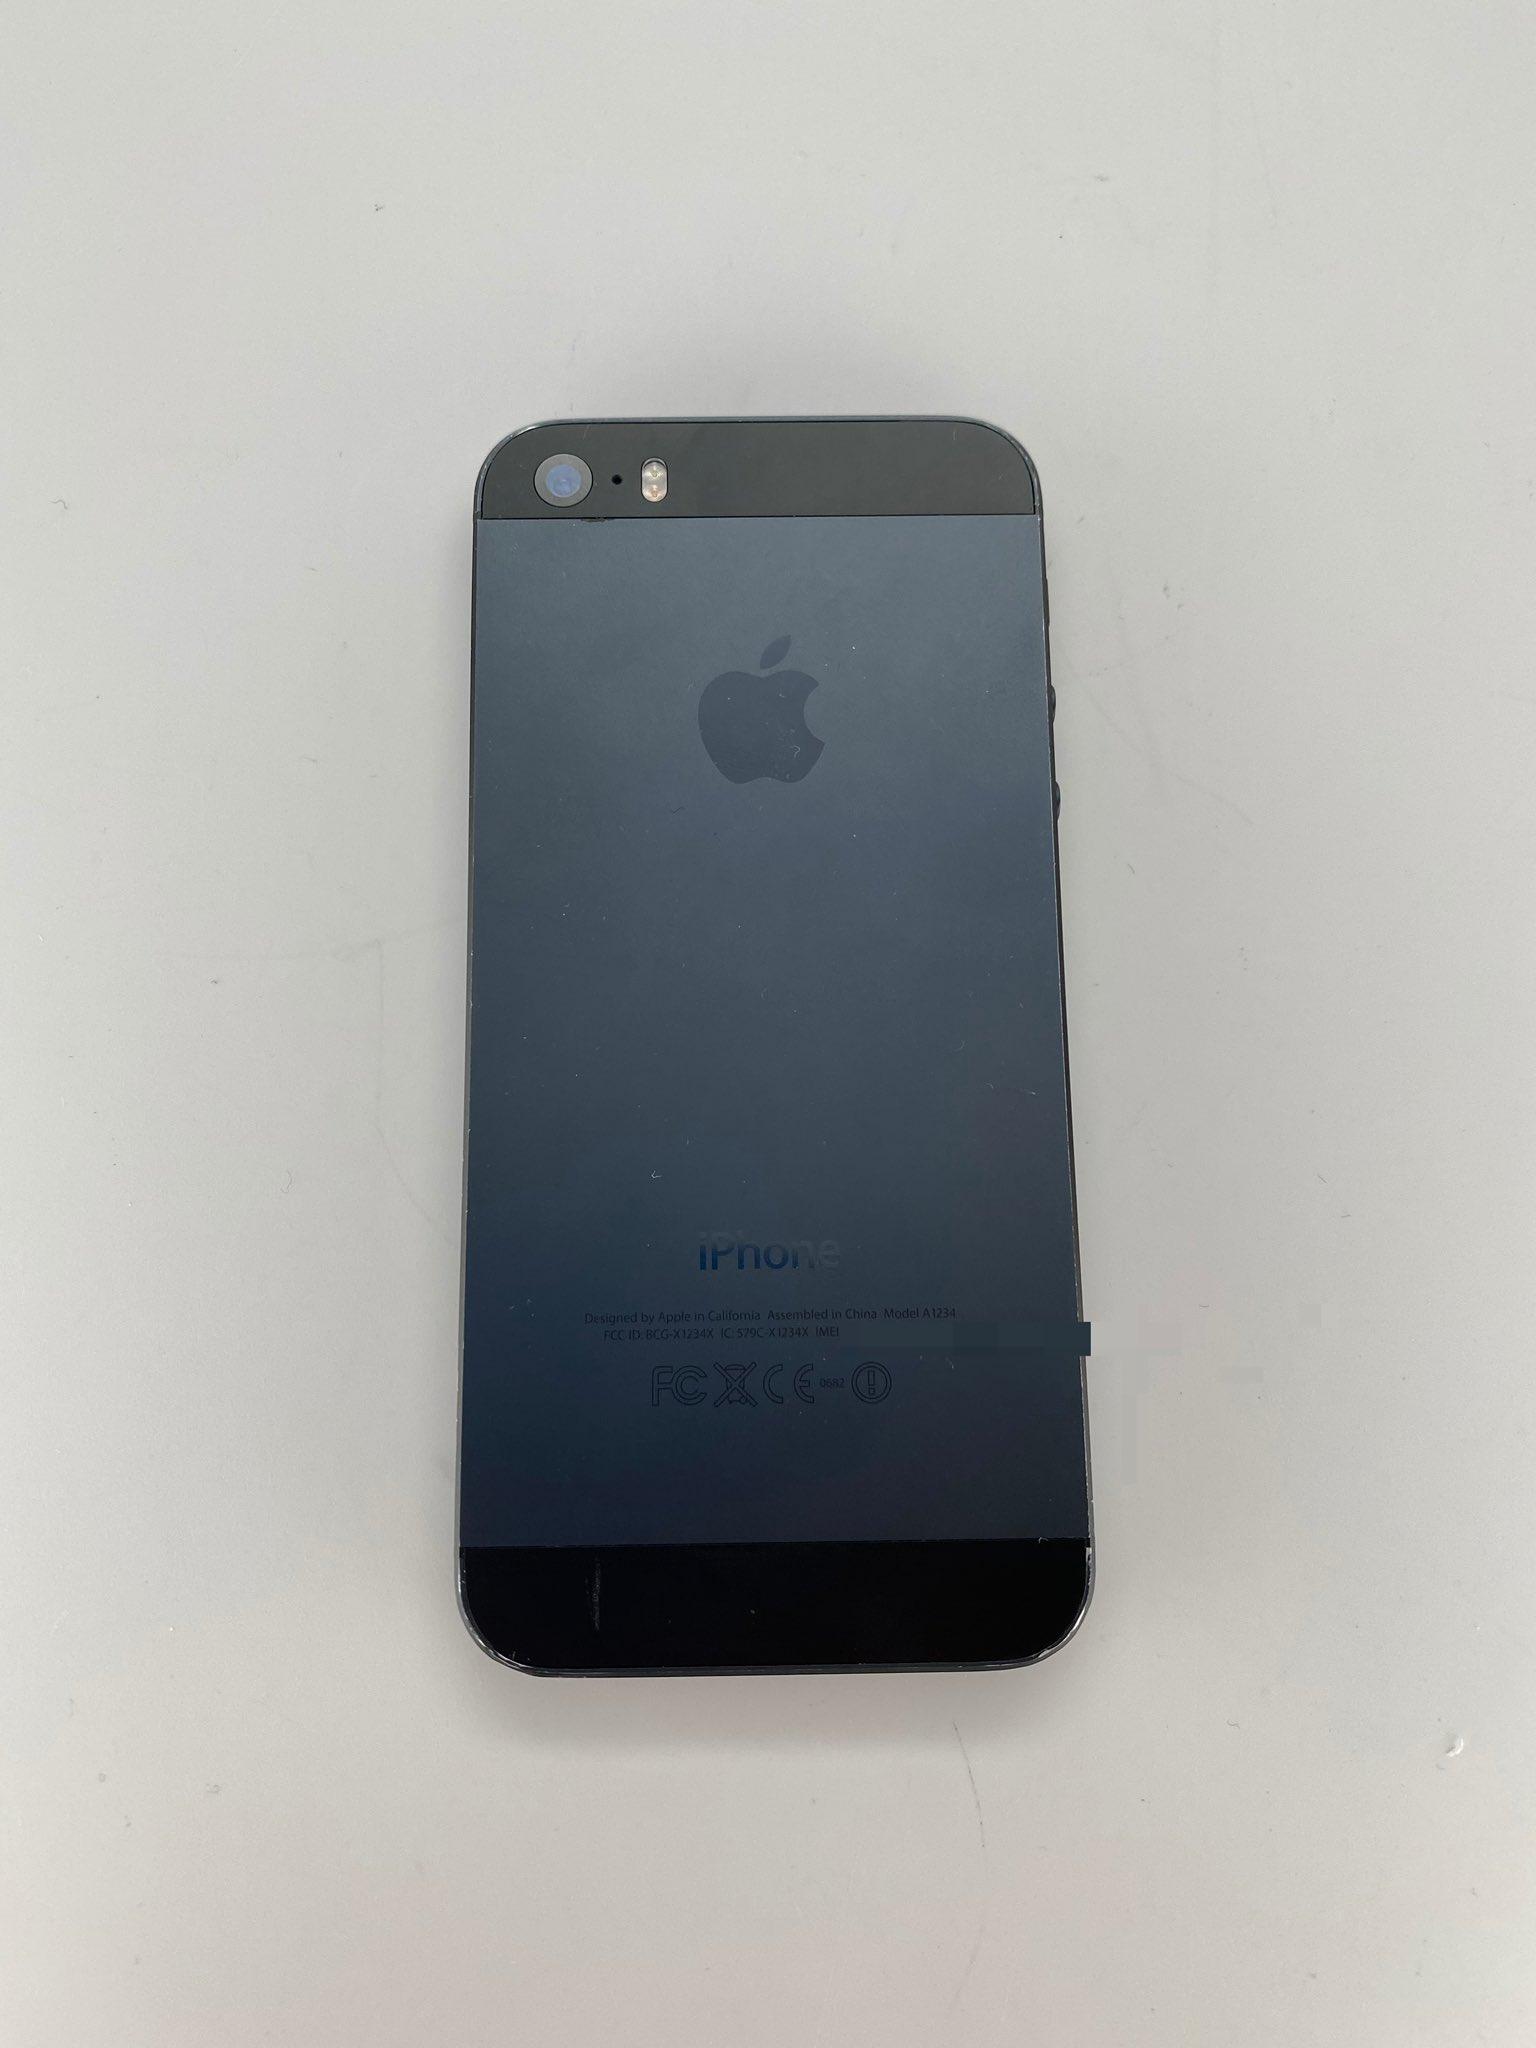 iPhone 5s w kolorze black and slate (źródło: Twitter @DongleBookPro)